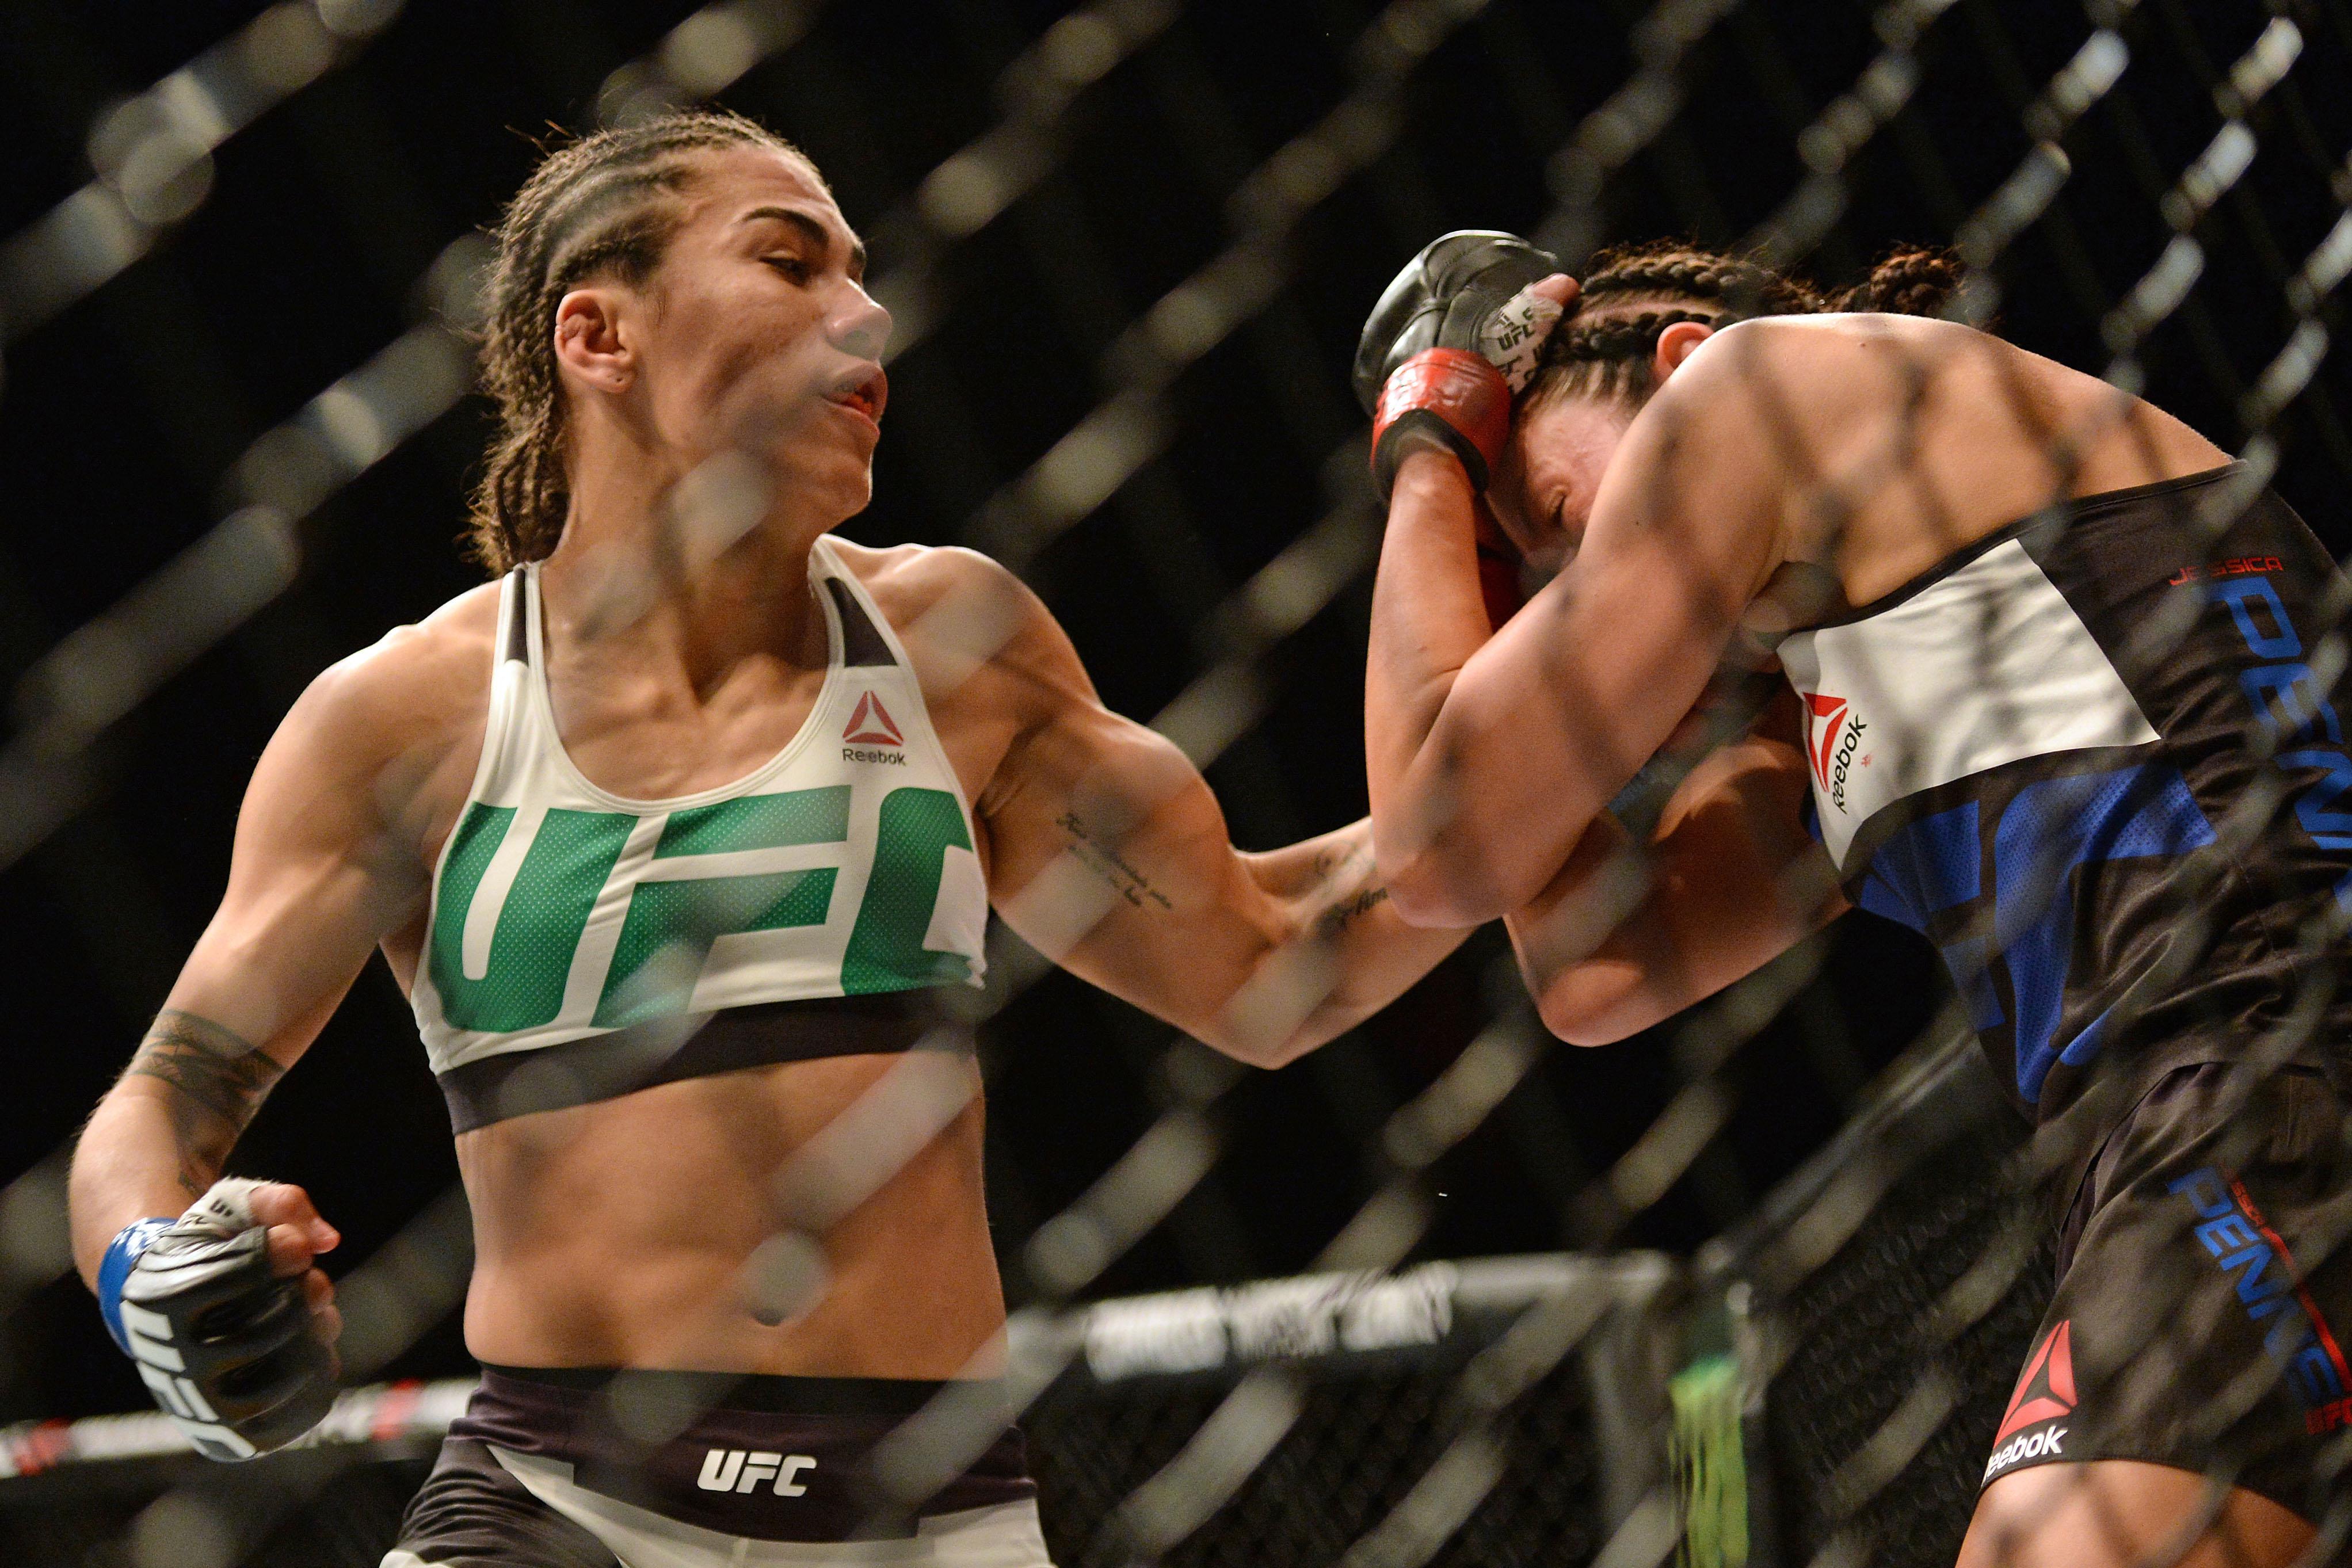 MMA: UFC 199-Andrade vs Penne